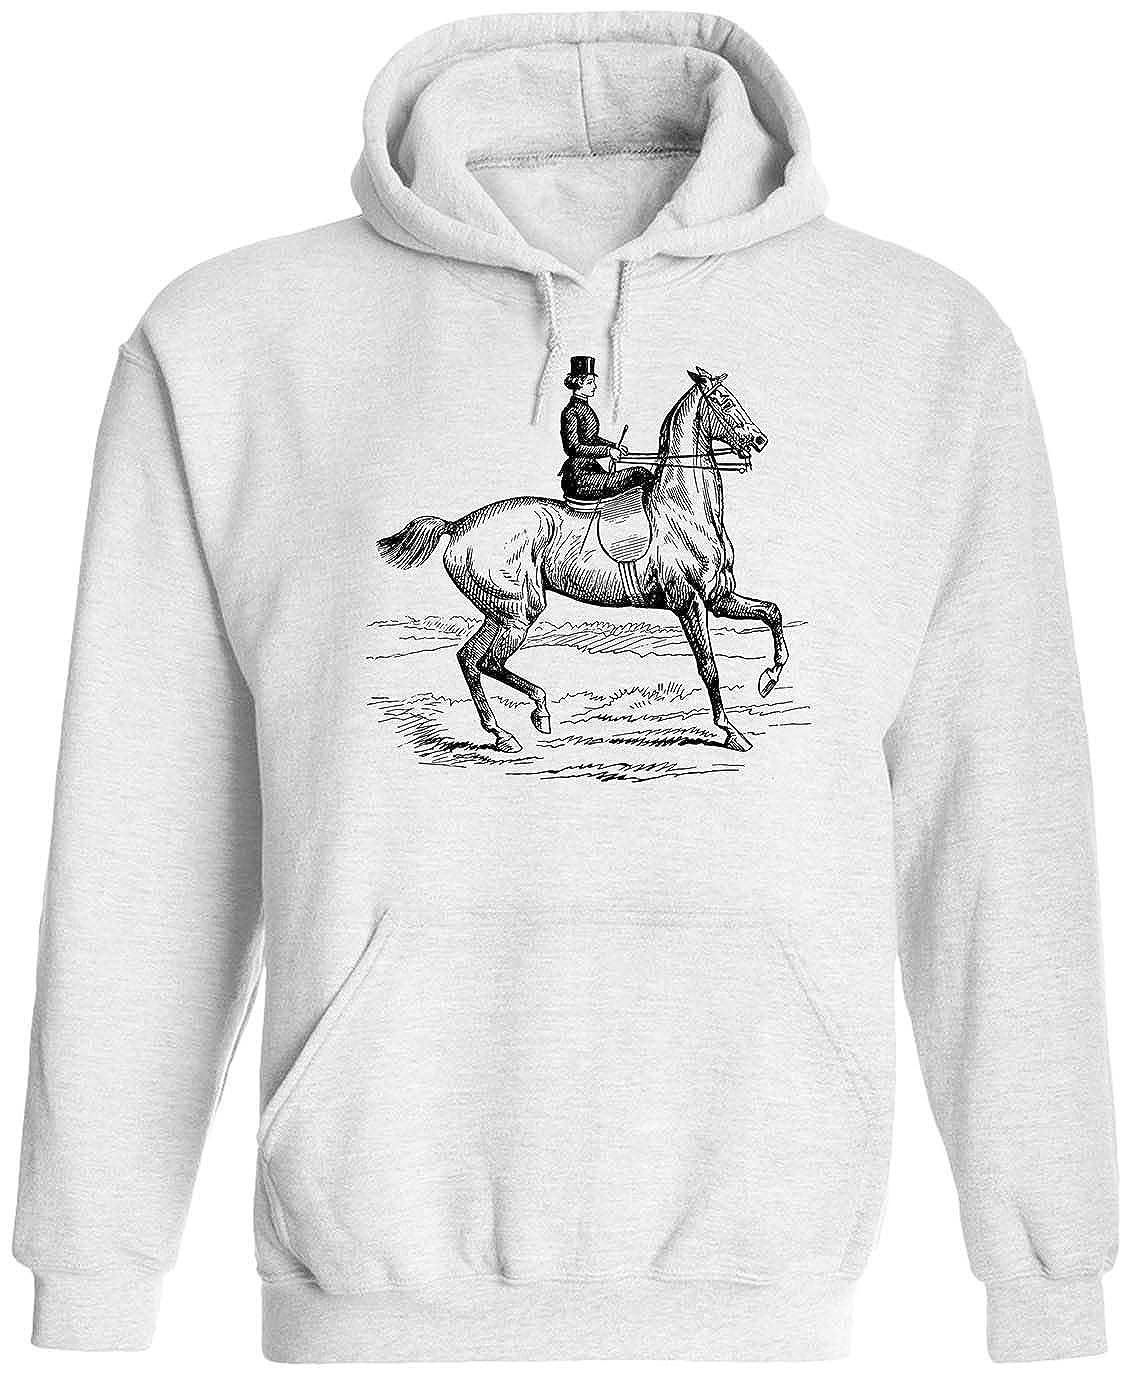 Austin Ink Apparel Spooked Horse Unisex Adult Hooded Pullover Sweatshirt